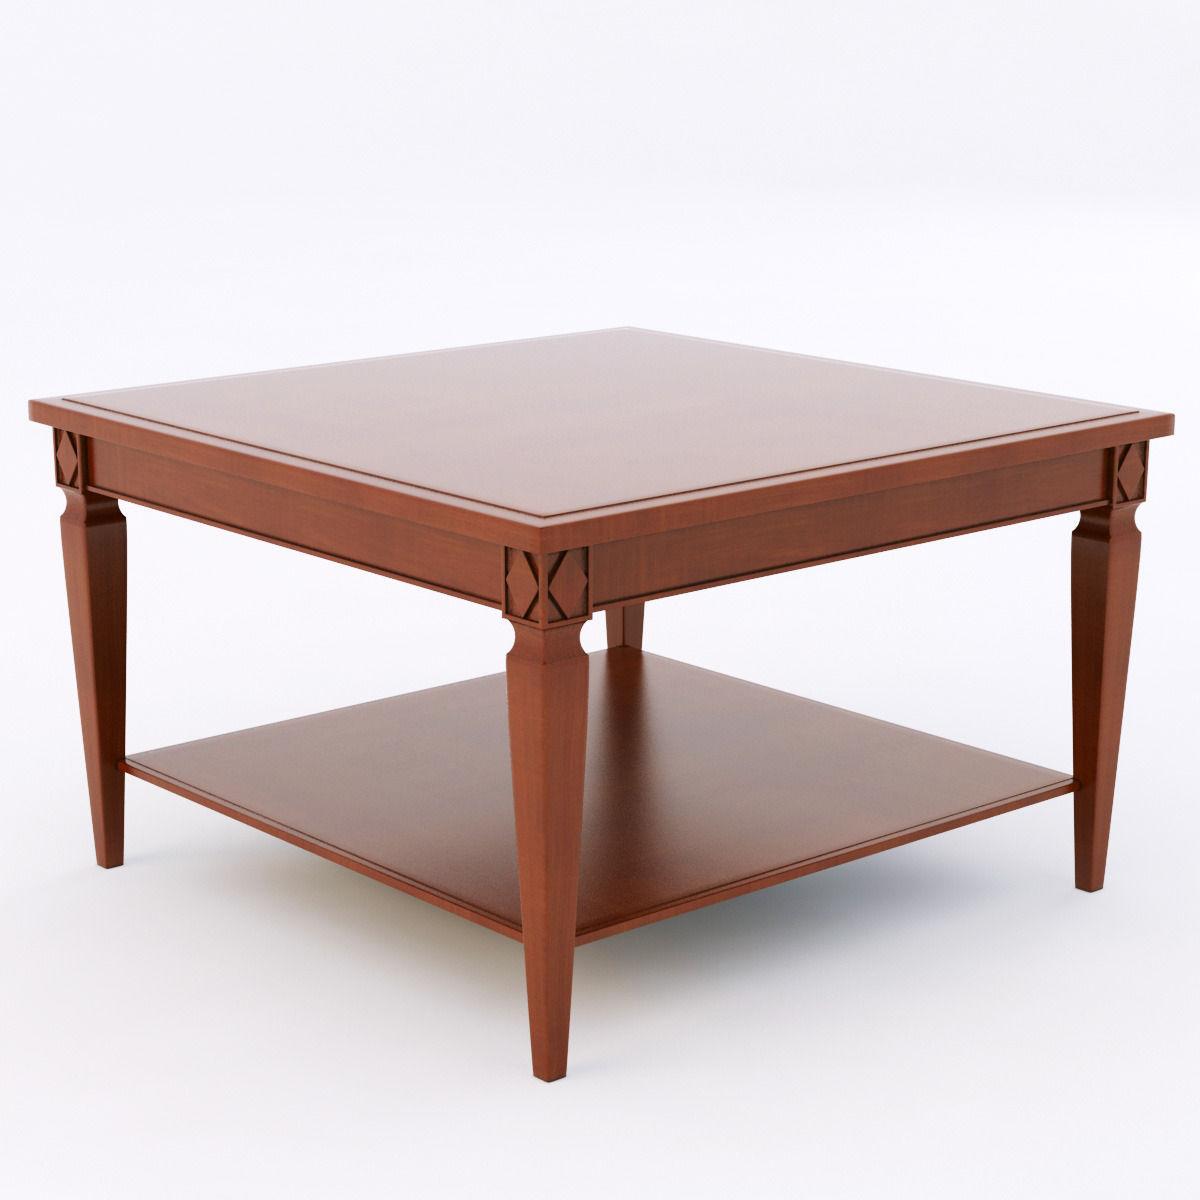 Selva 3371 Coffee Table 3d Model Max Obj Fbx